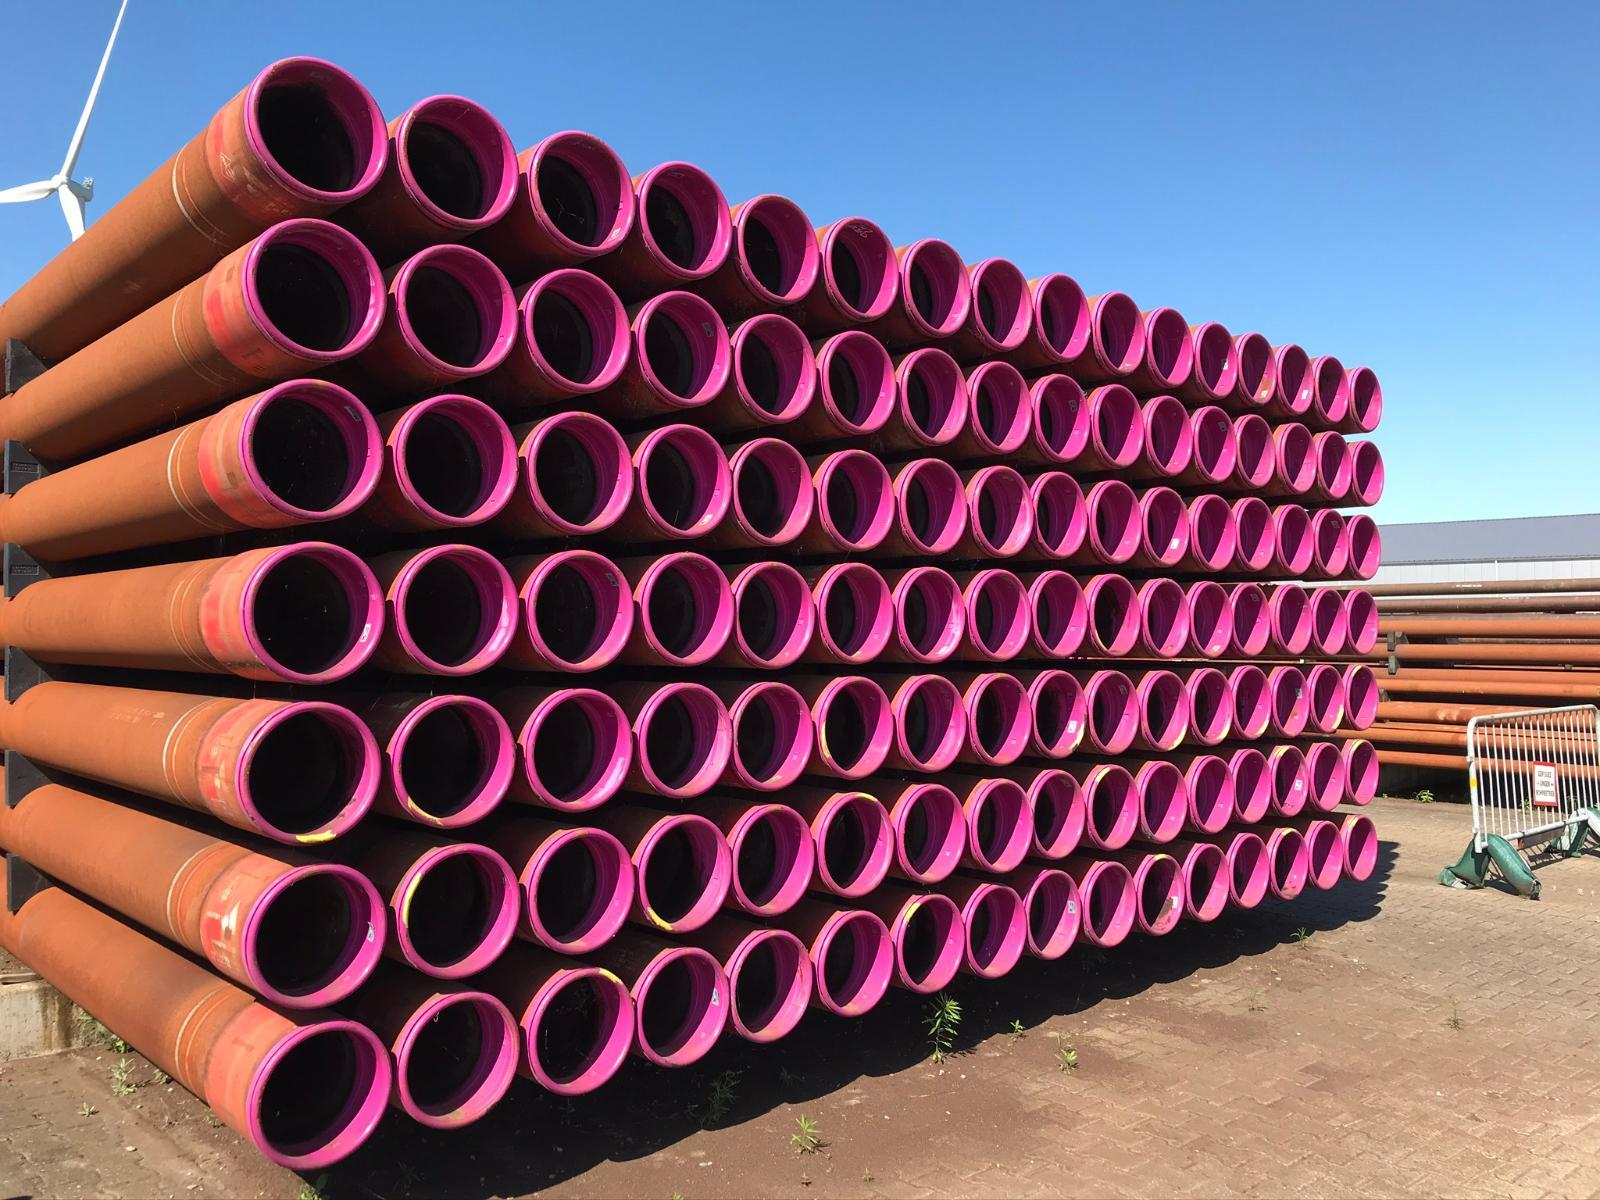 13 3/8 68# L80 VAM 21 R3 Surplus Casing (4,840 Feet / 149 Metric Tons)